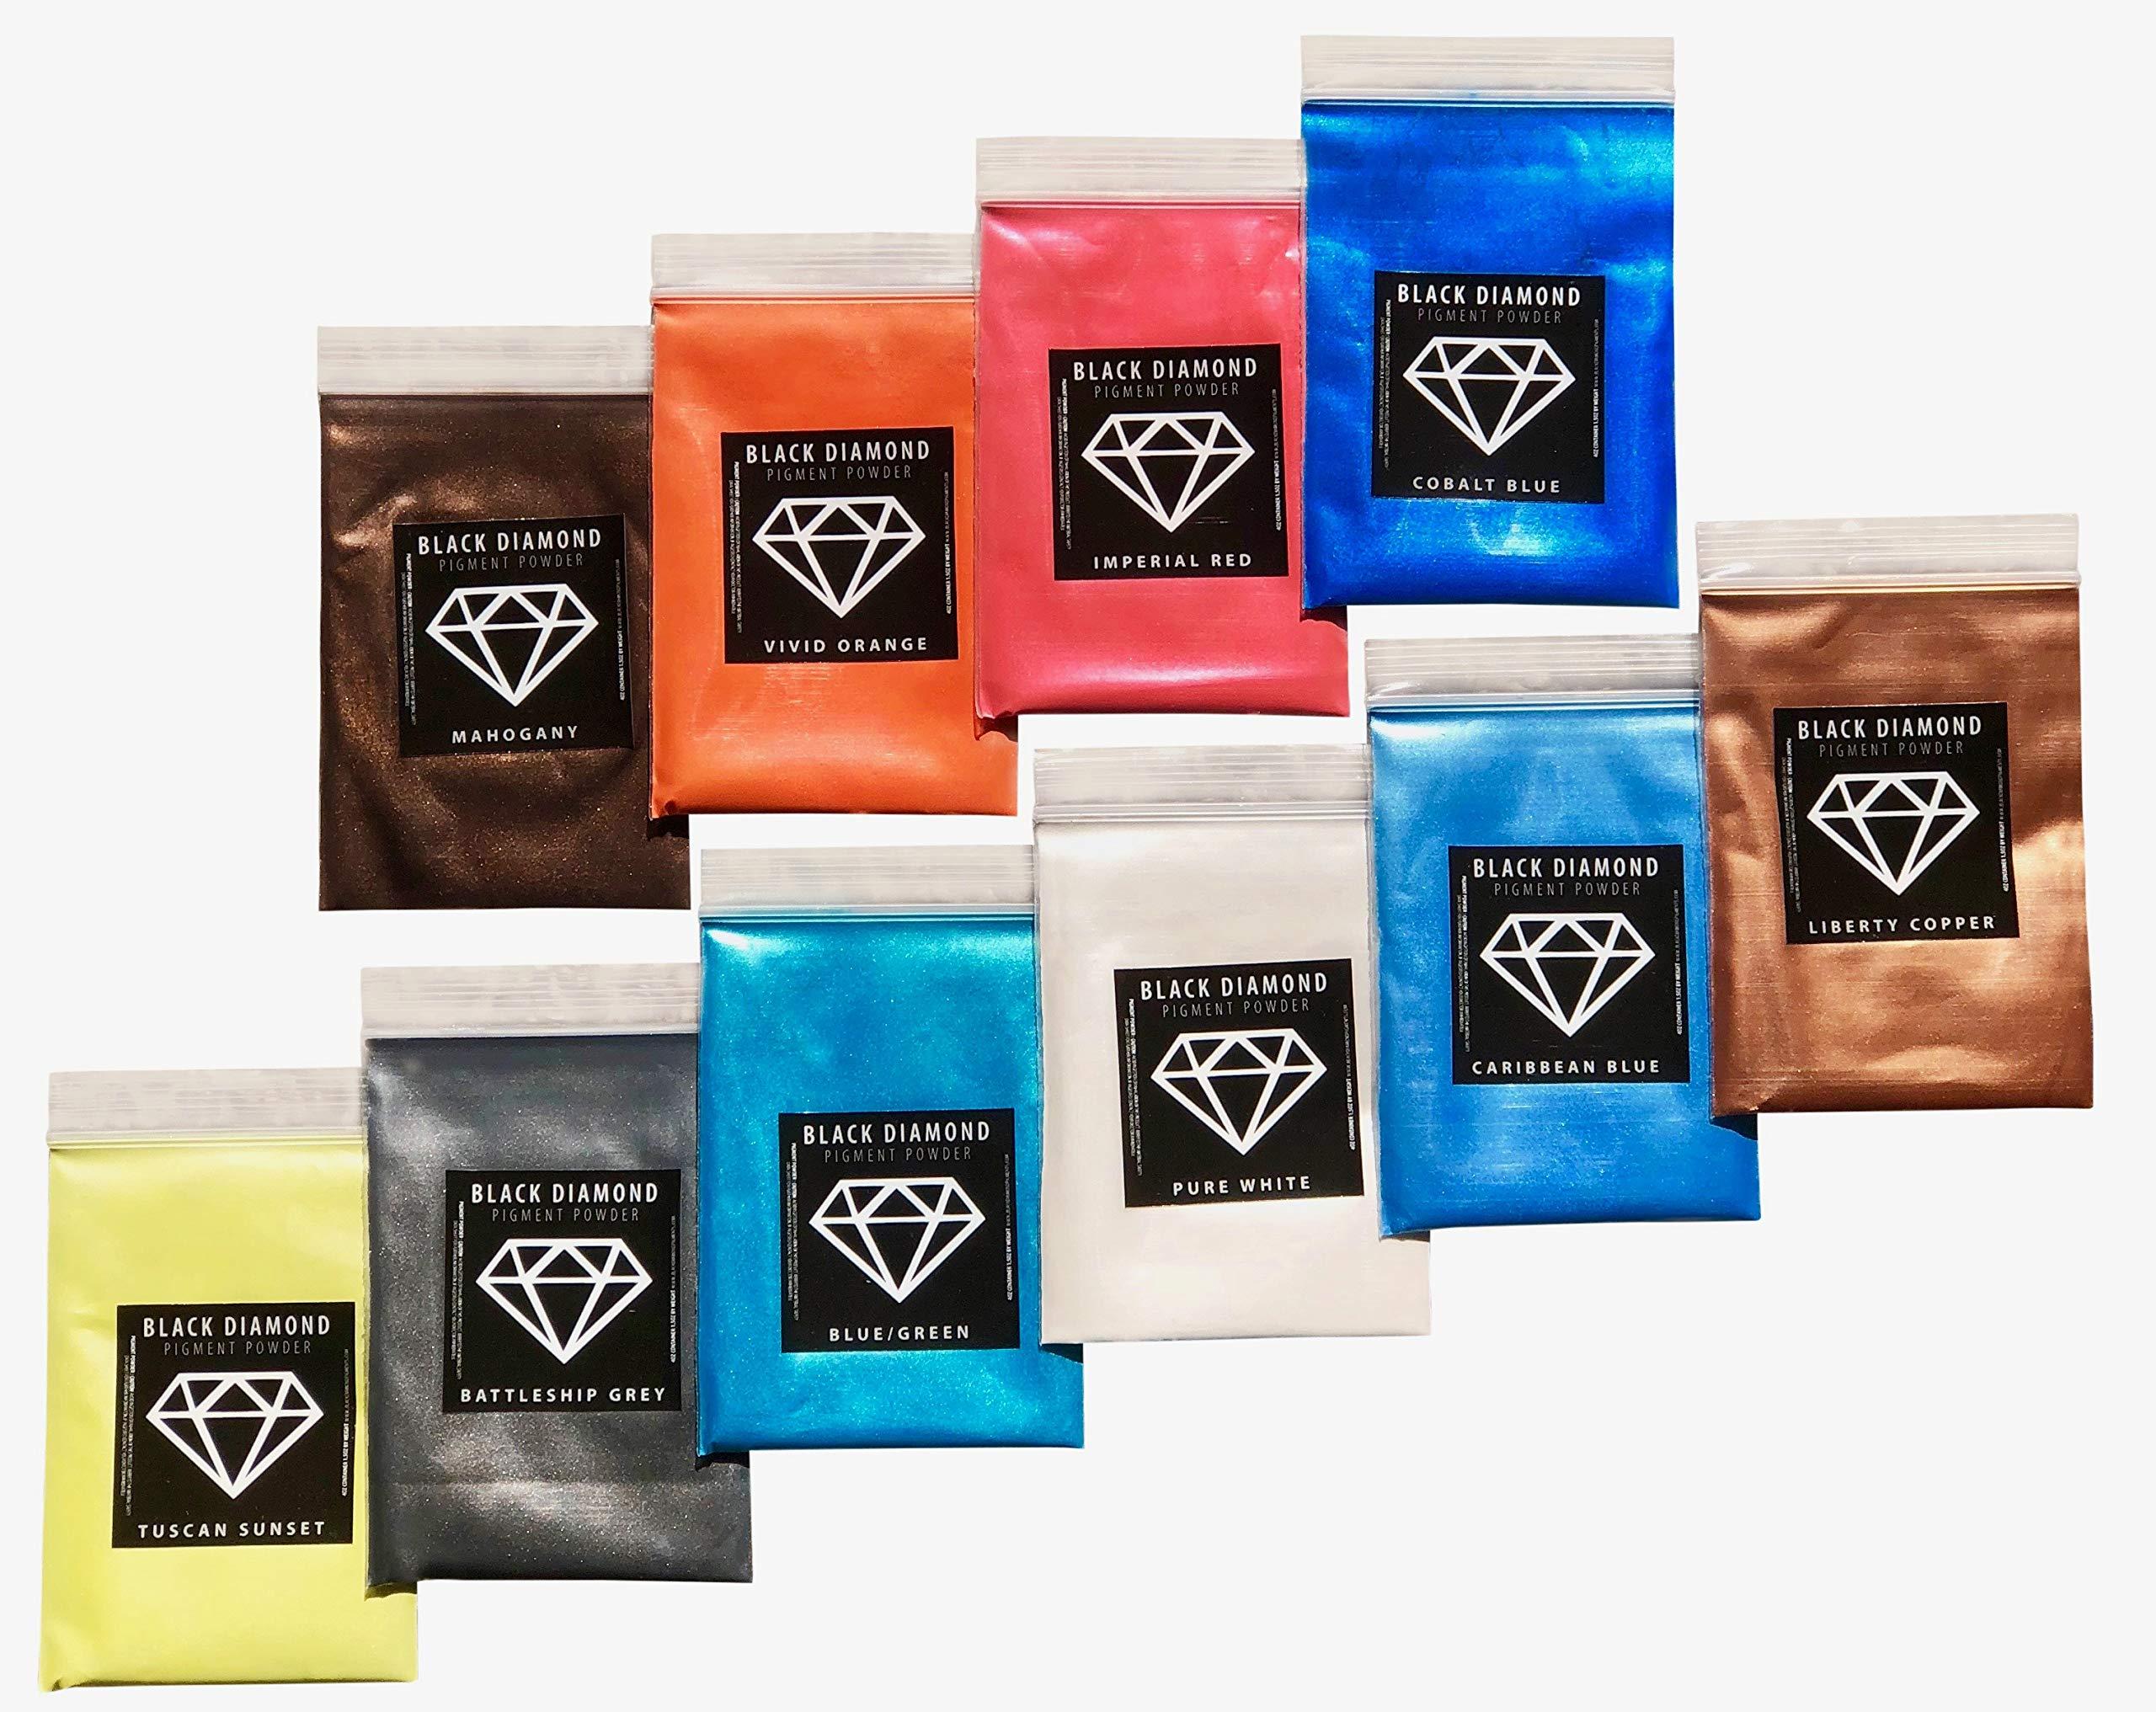 Variety Pack 1 (10 Colors) Mica Powder Pure, 2TONE Series Variety Pigment Packs (Epoxy,Paint,Color,Art) Black Diamond Pigments